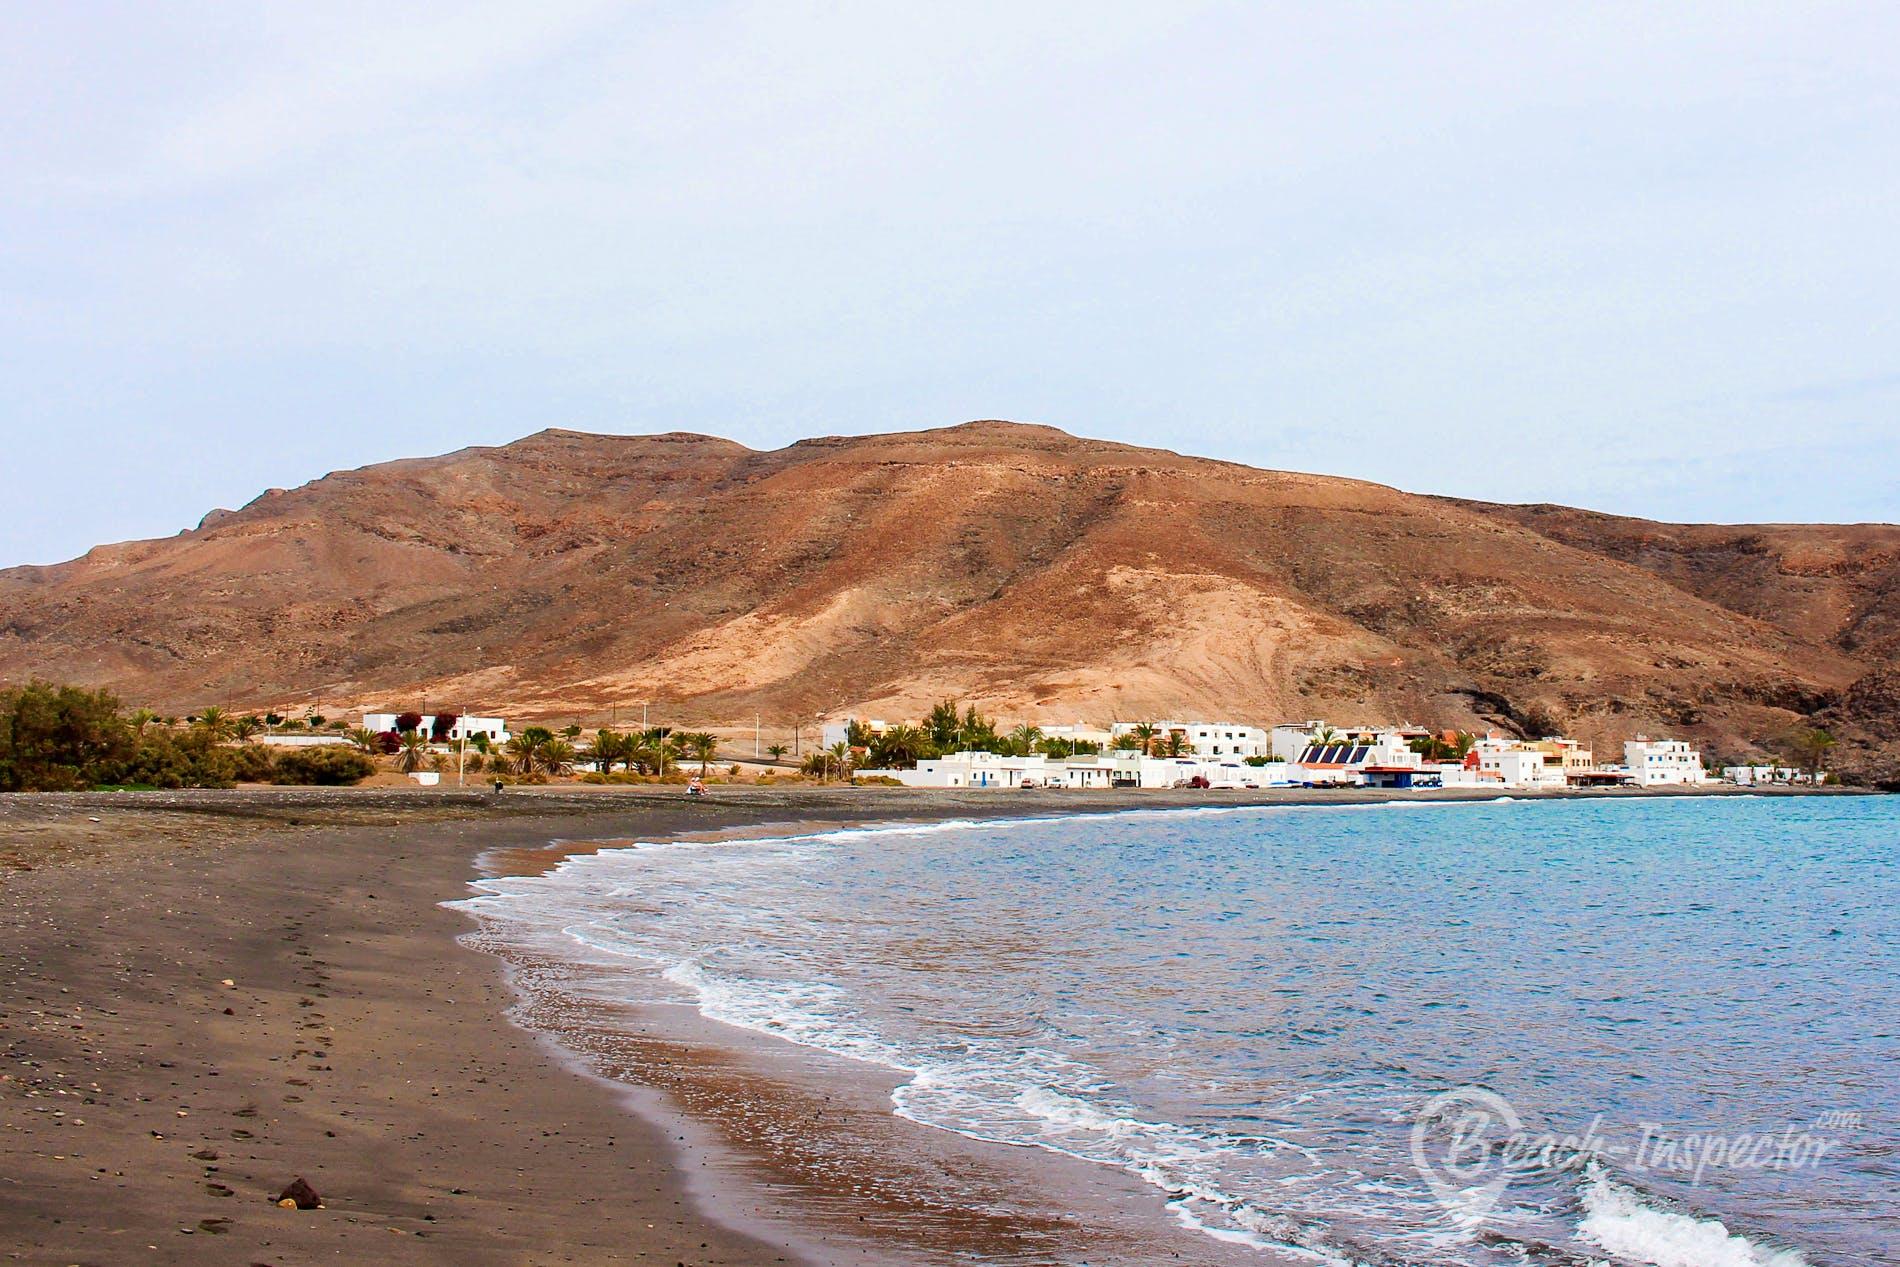 Beach Giniginamar, Fuerteventura, Spain